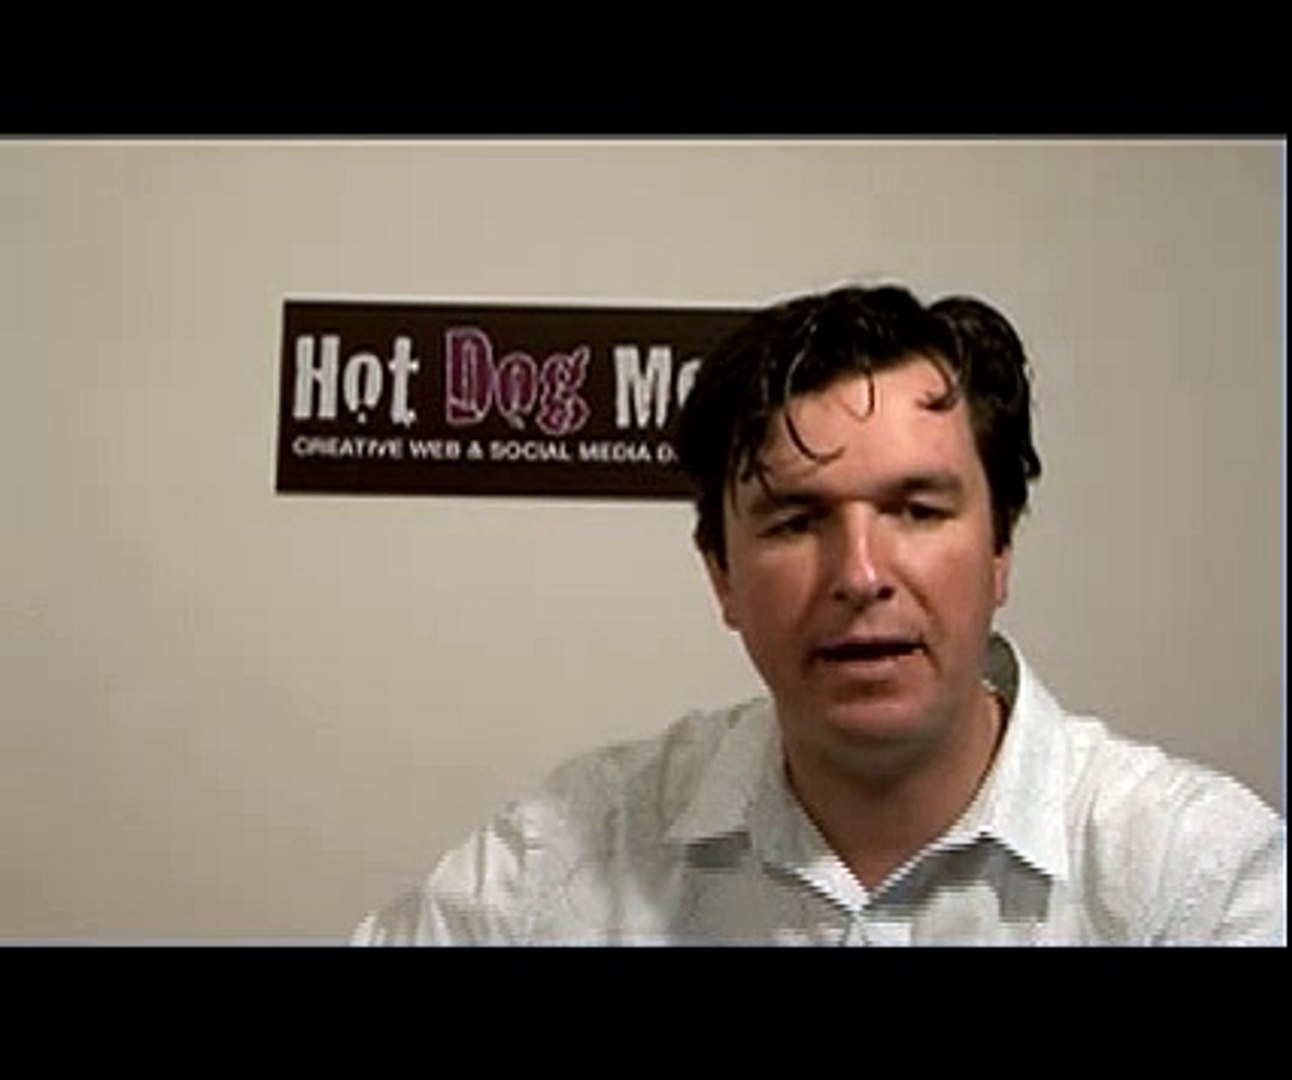 Hot Dog Media Clients Nash Manor